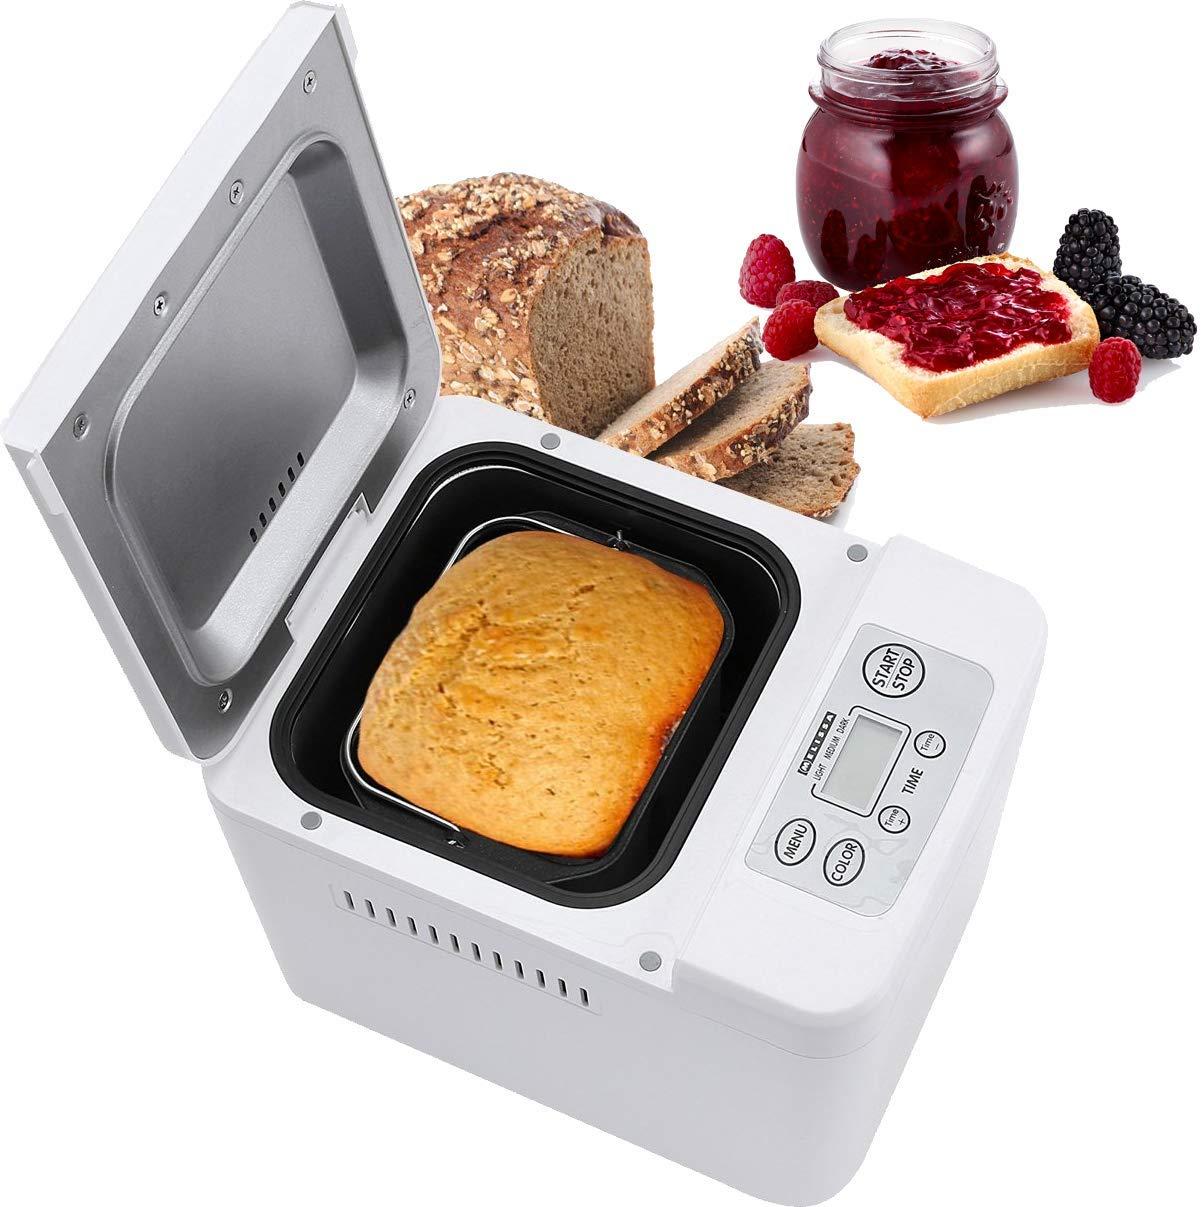 Melissa 16260010 - Panificadora (con preparación automática de masa y pan, Panificadora para hacer pan de mermeladas de Yoghurt de pizza Masa, ...